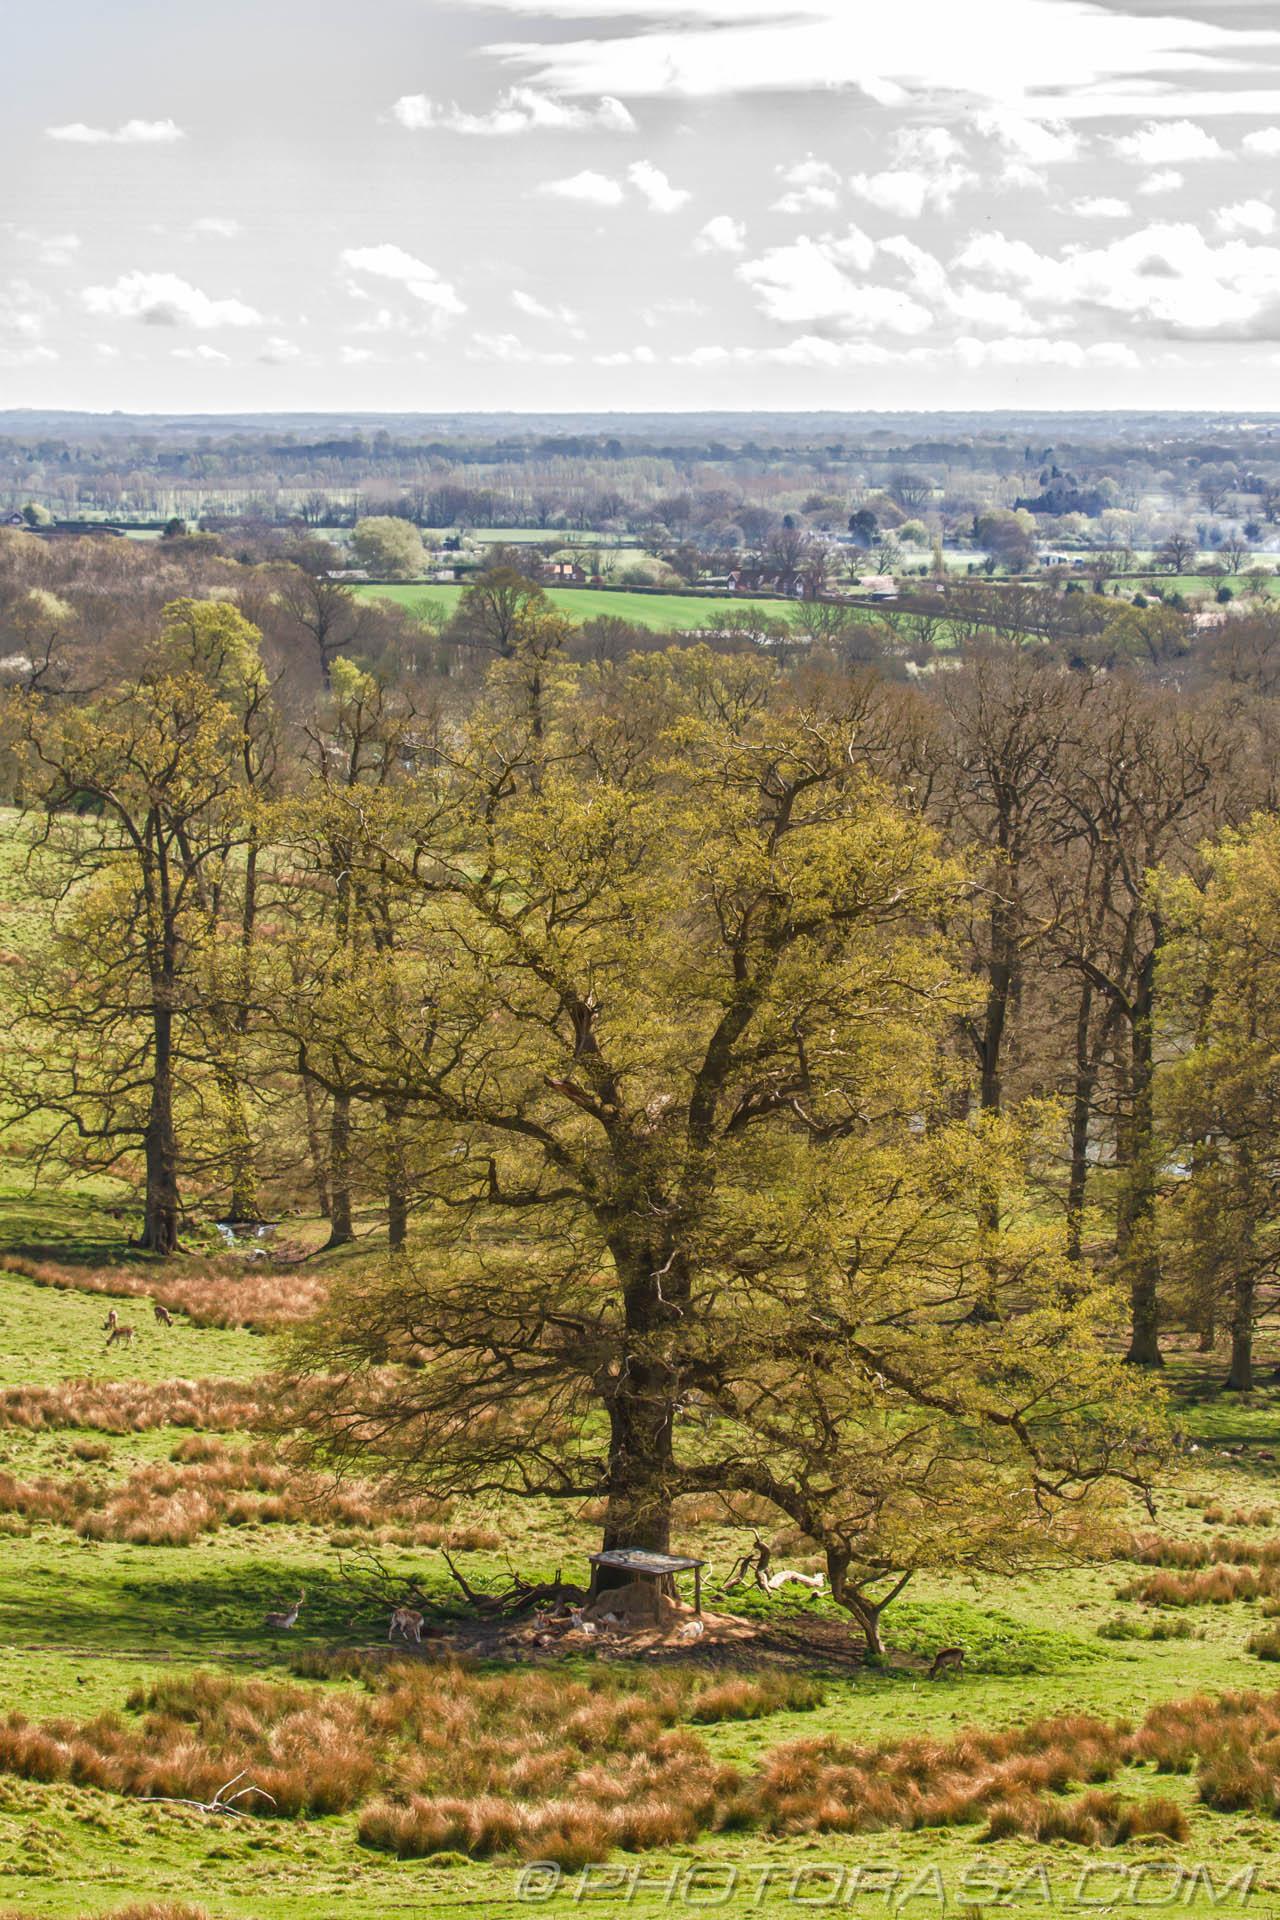 http://photorasa.com/view-boughton-monchelsea-churchyard/deer-under-great-oak/